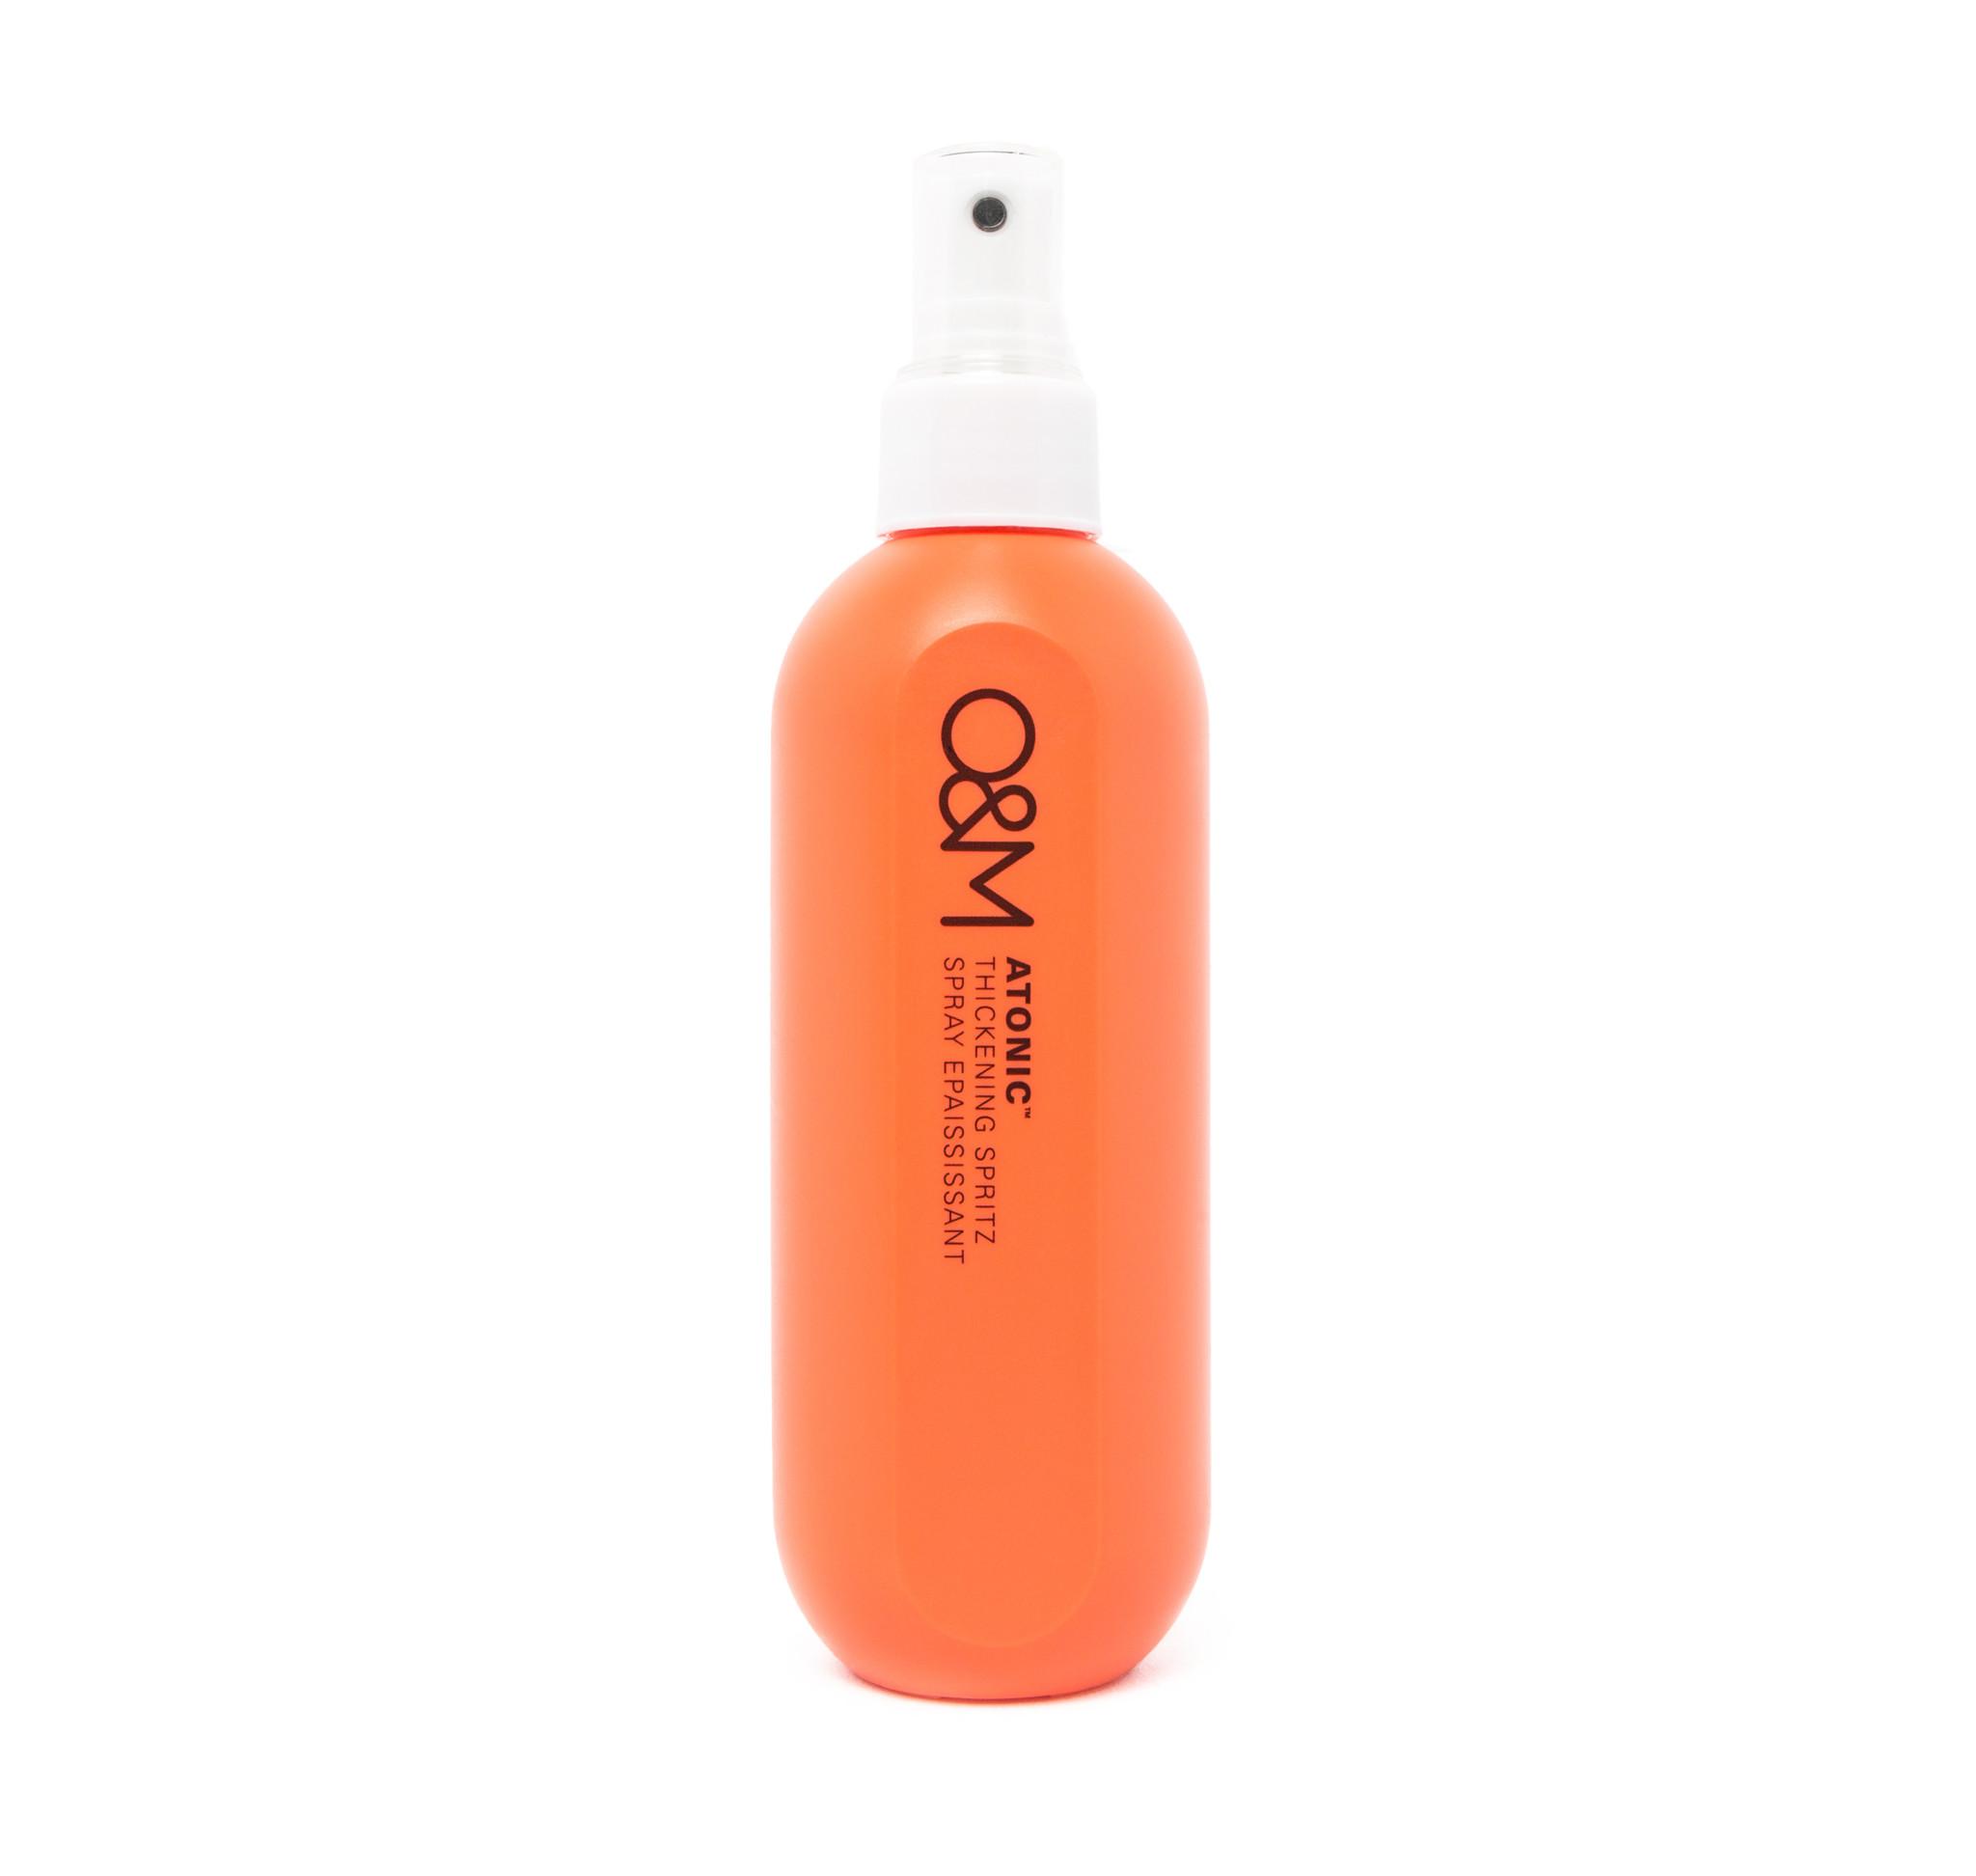 O&M - Original Mineral O&M Atonic Thickening Spray - Spray Epaississant  - 250 ml